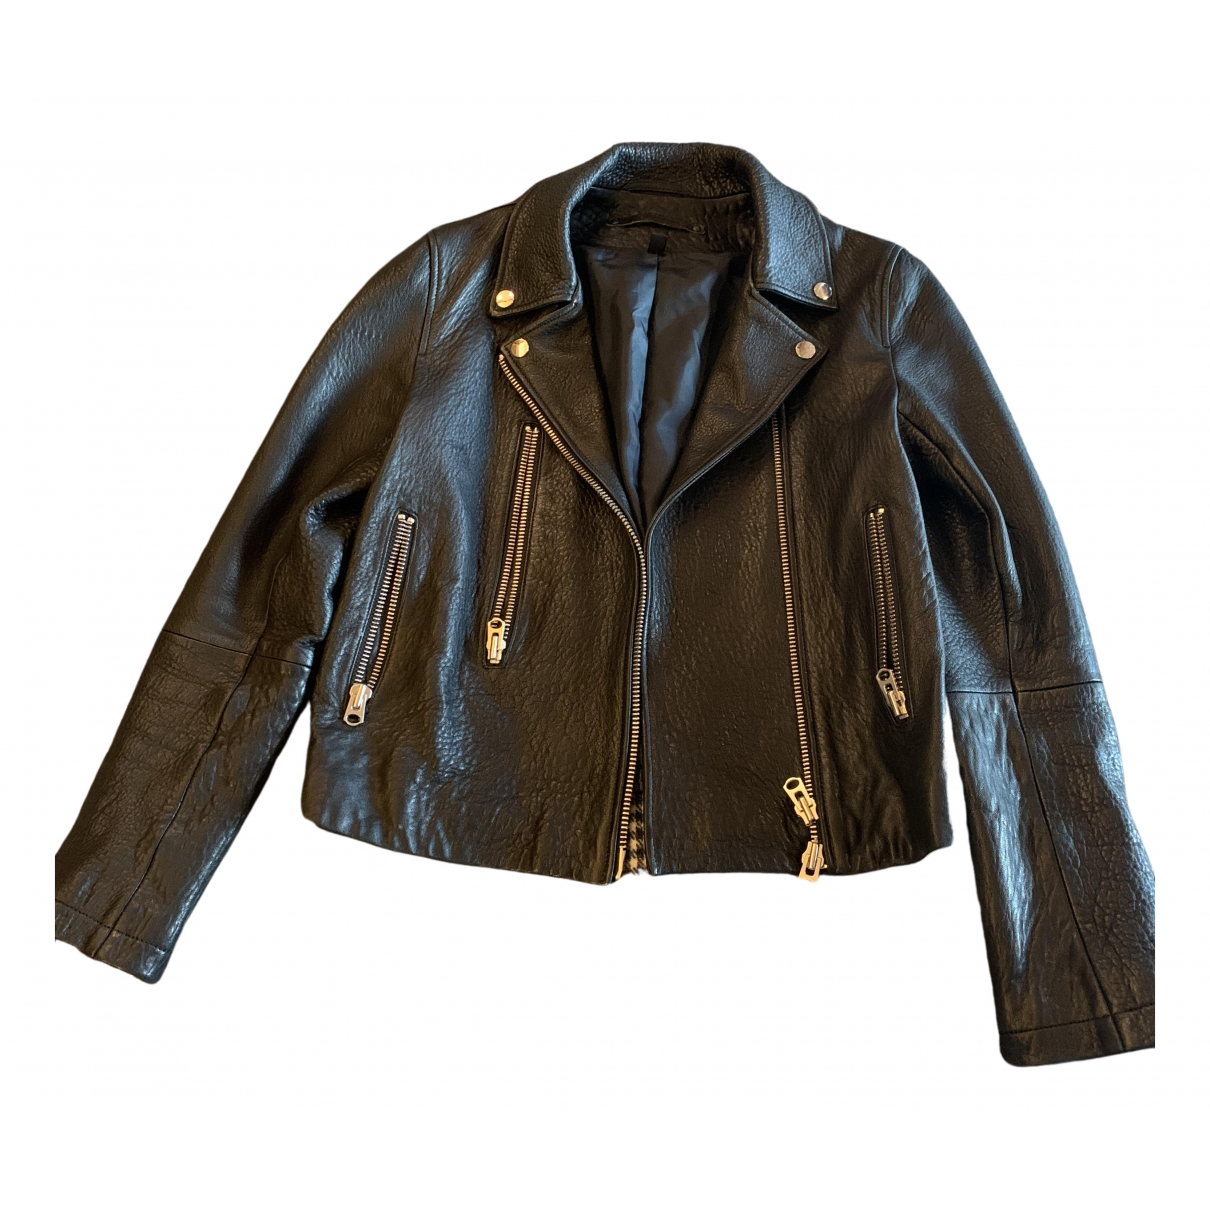 tophop Boutique N Black Leather Leather jacket for Women 36 FR